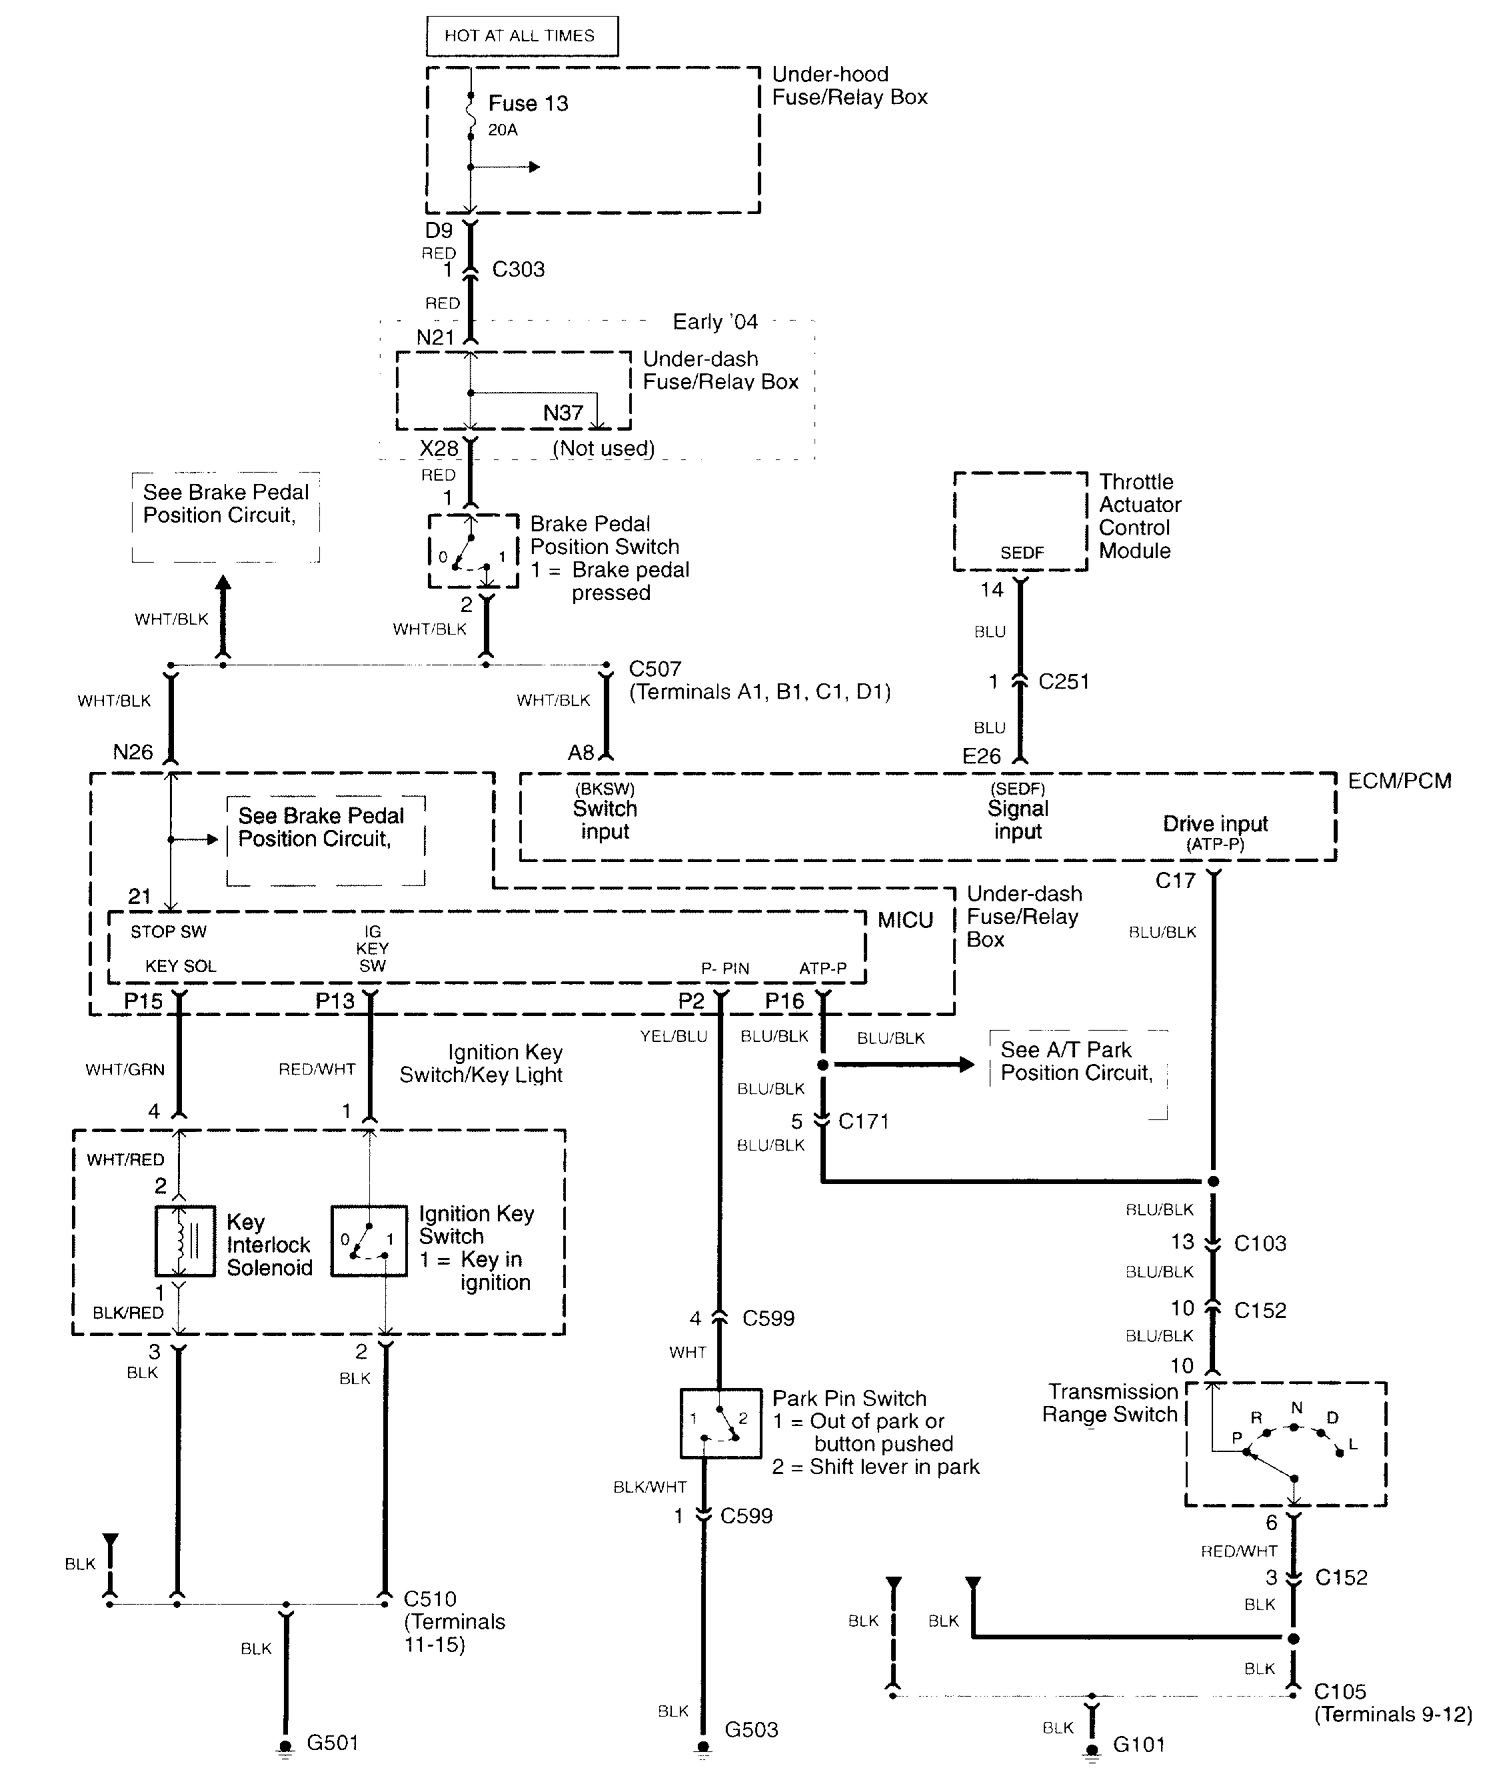 2000 Deville Shift Lock Wiring Diagram Block Diagram Of 16 Bit Microcontroller Bege Wiring Diagram